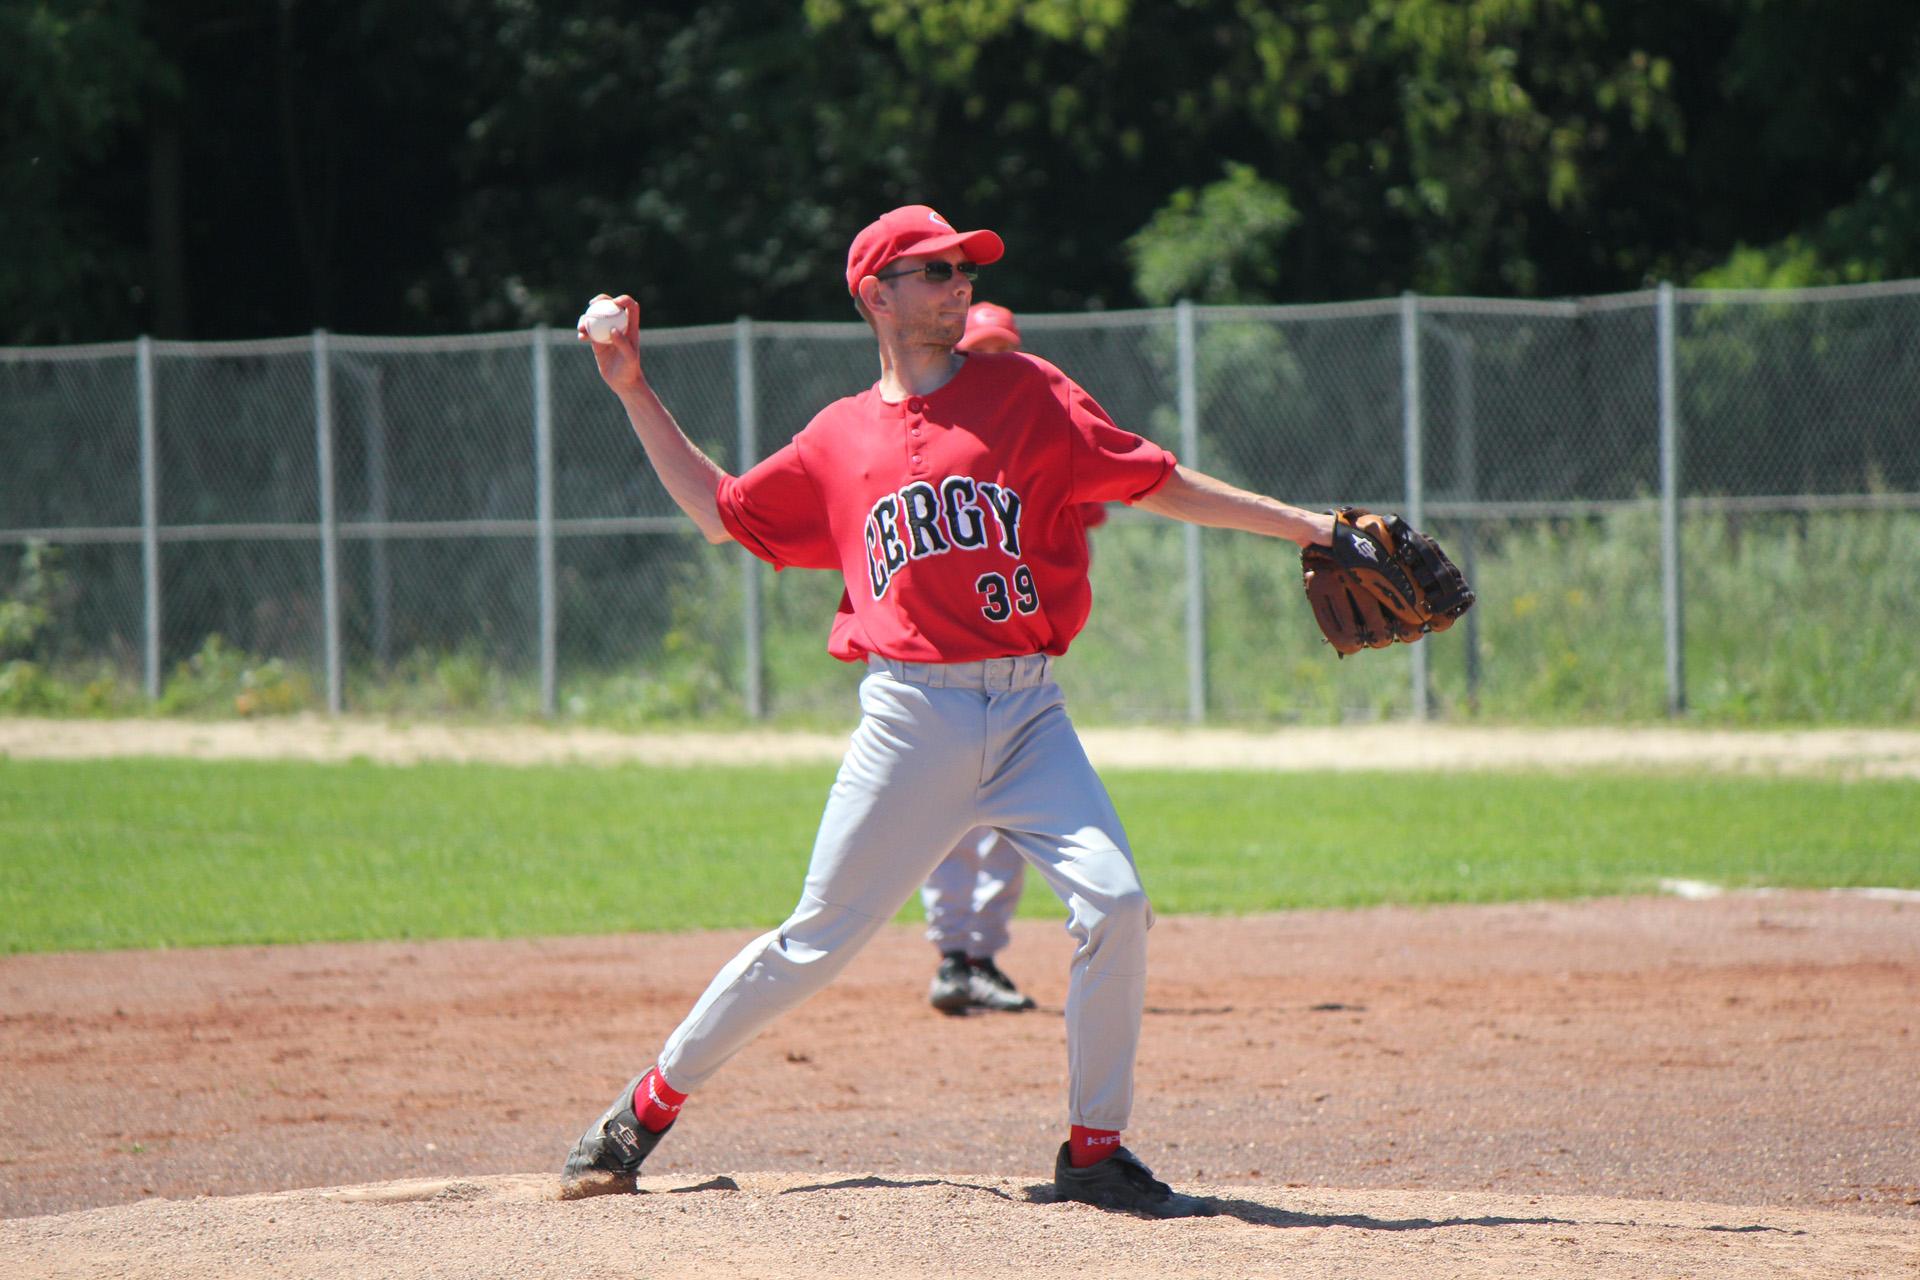 2011-06-26 Baseball (14)